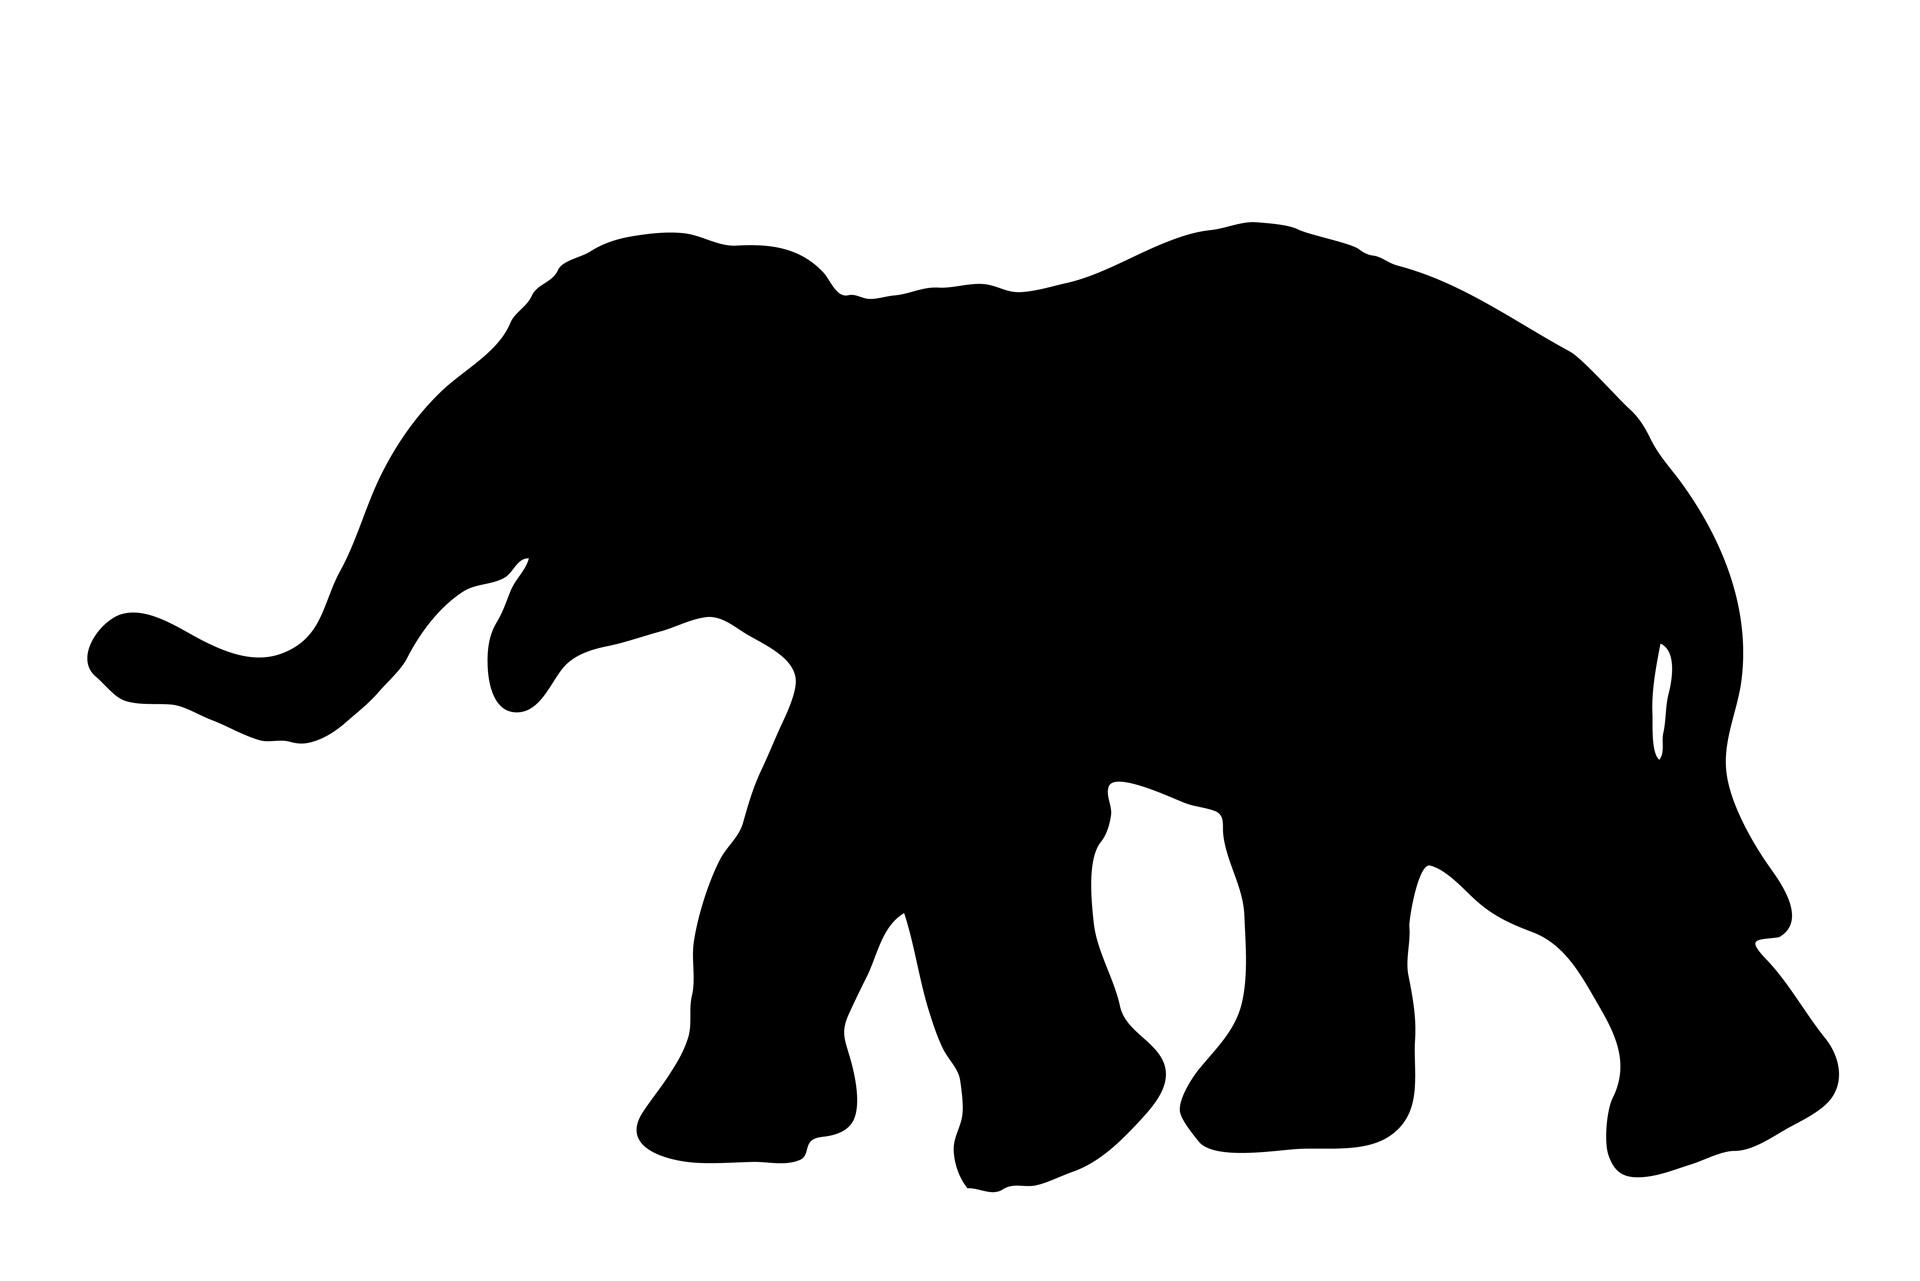 1920x1281 Elephant Silhouette Free Stock Photo